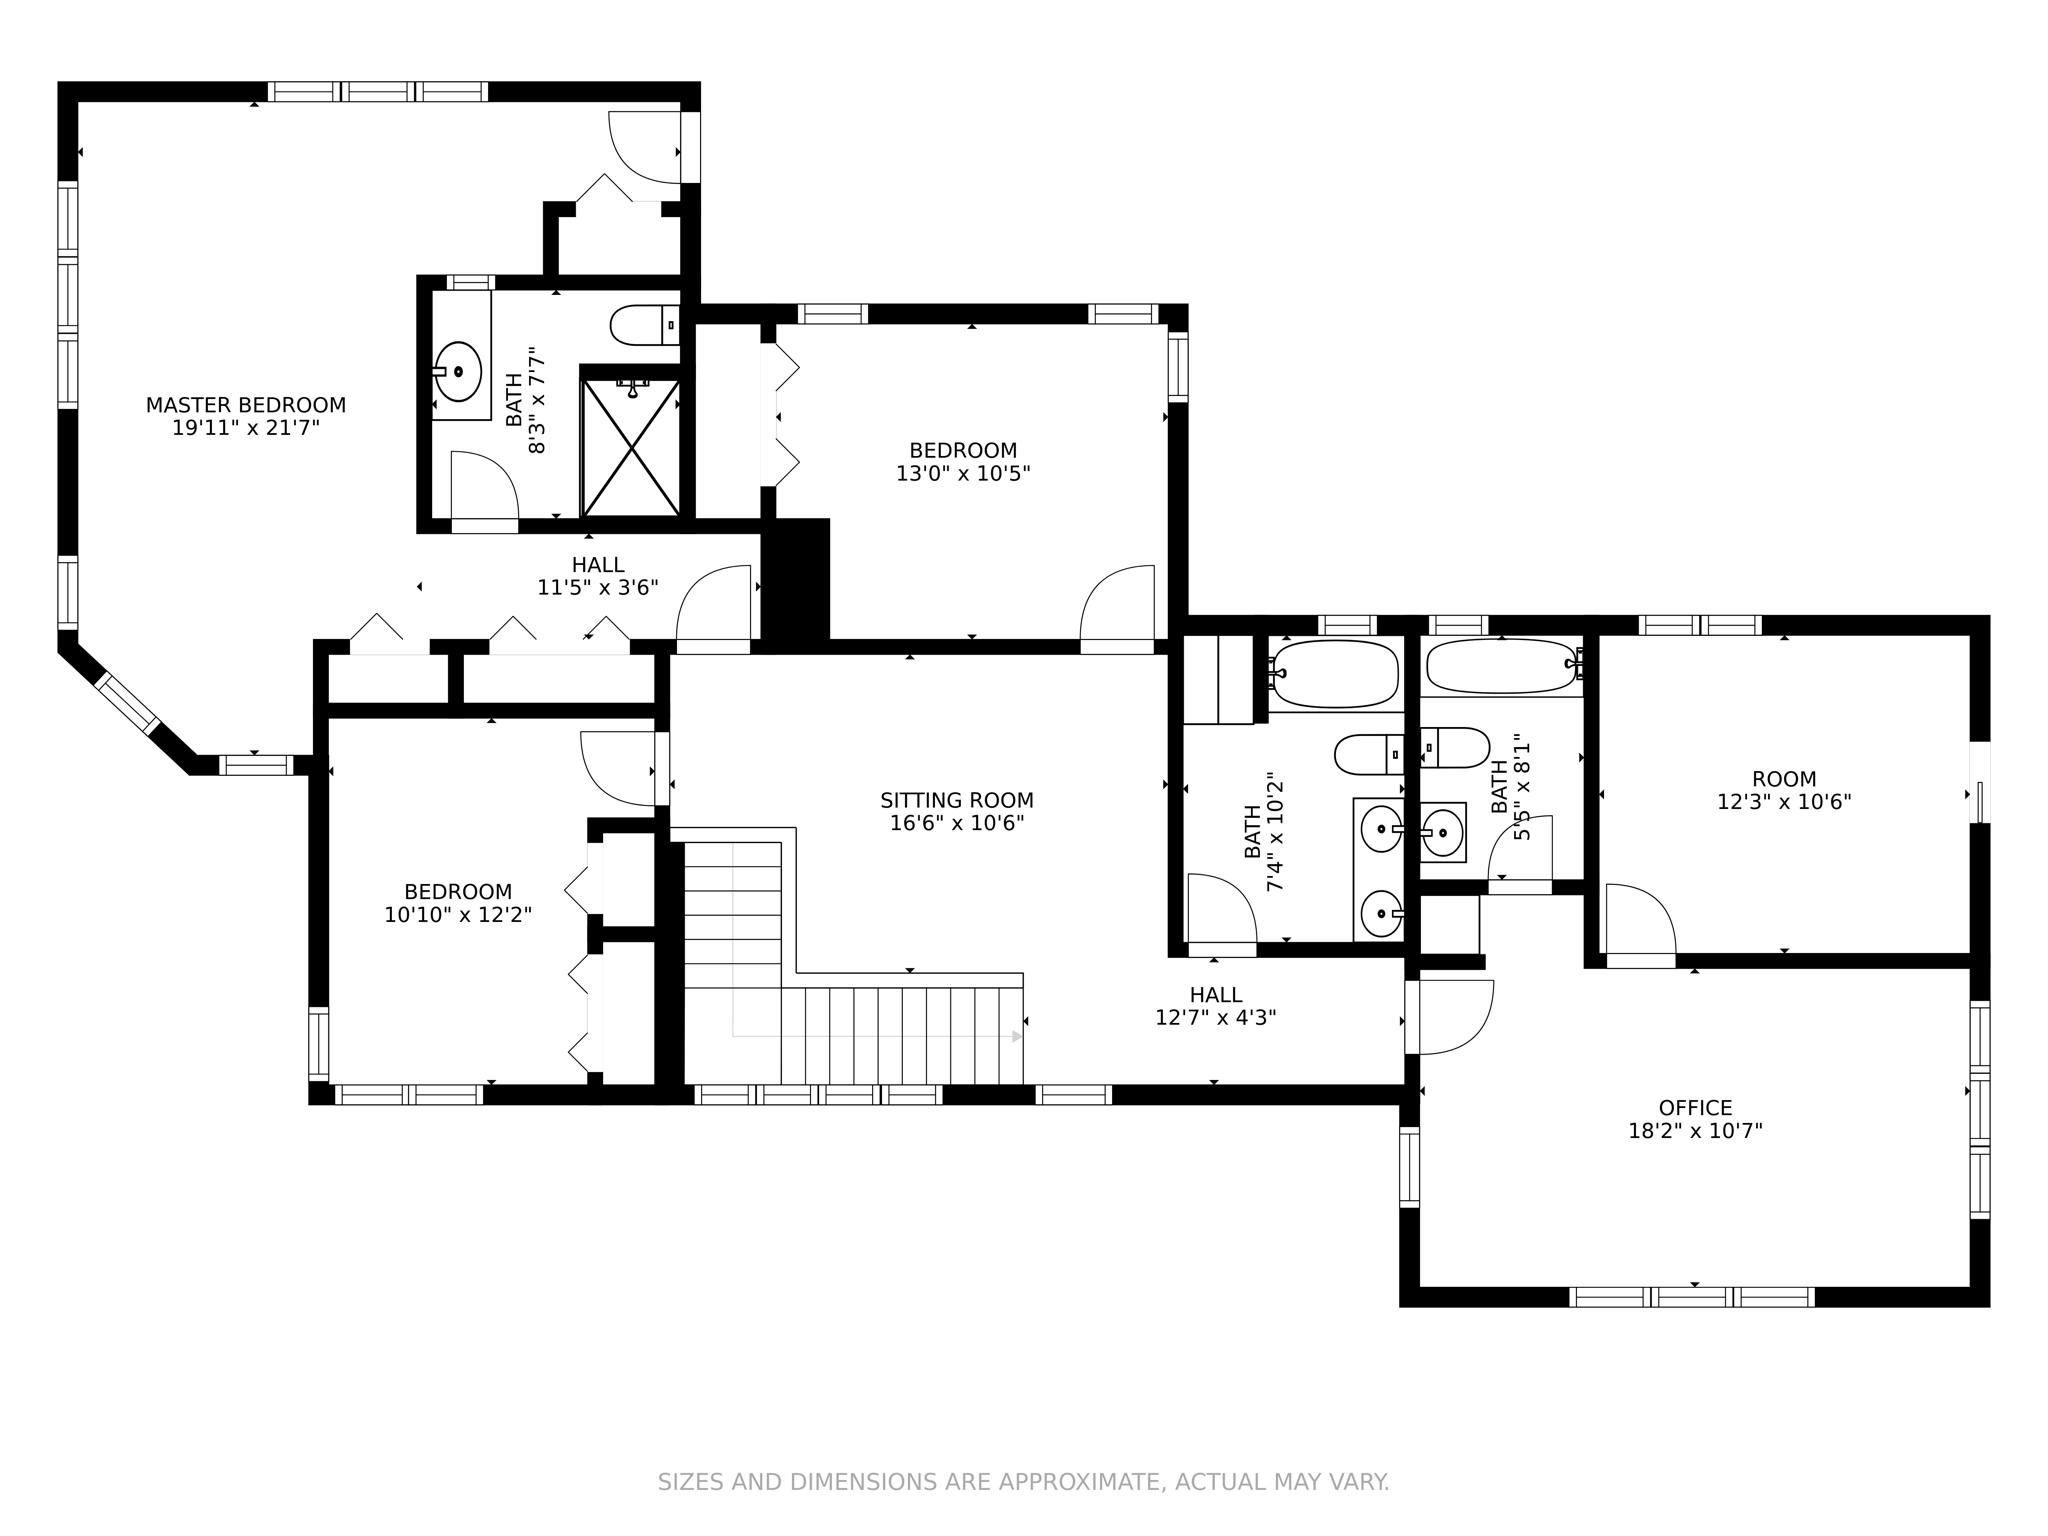 Floorplan #3